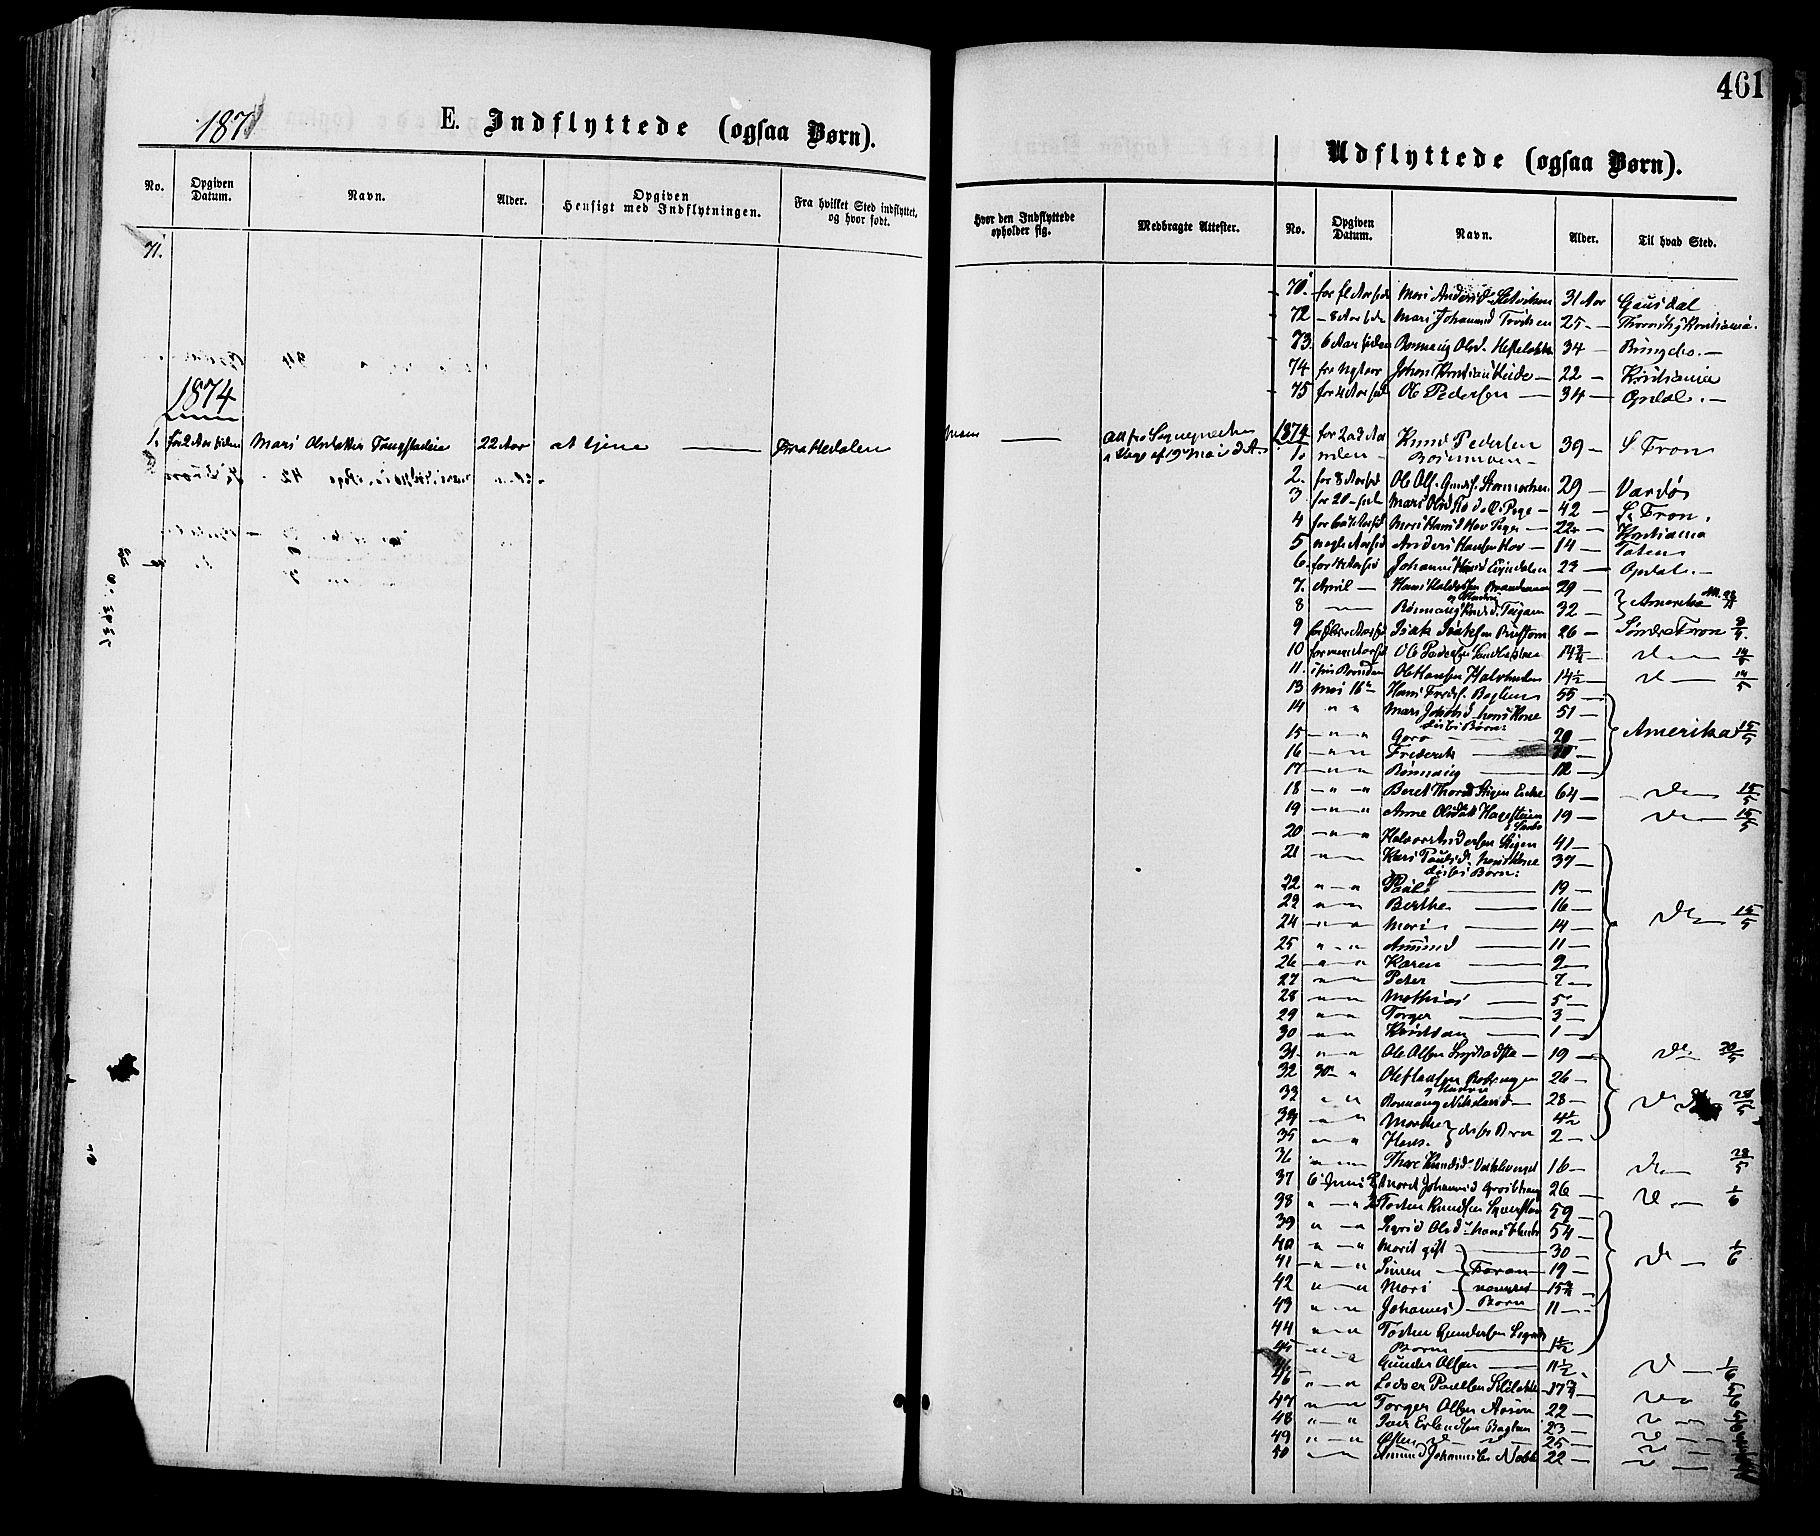 SAH, Nord-Fron prestekontor, Ministerialbok nr. 2, 1865-1883, s. 461